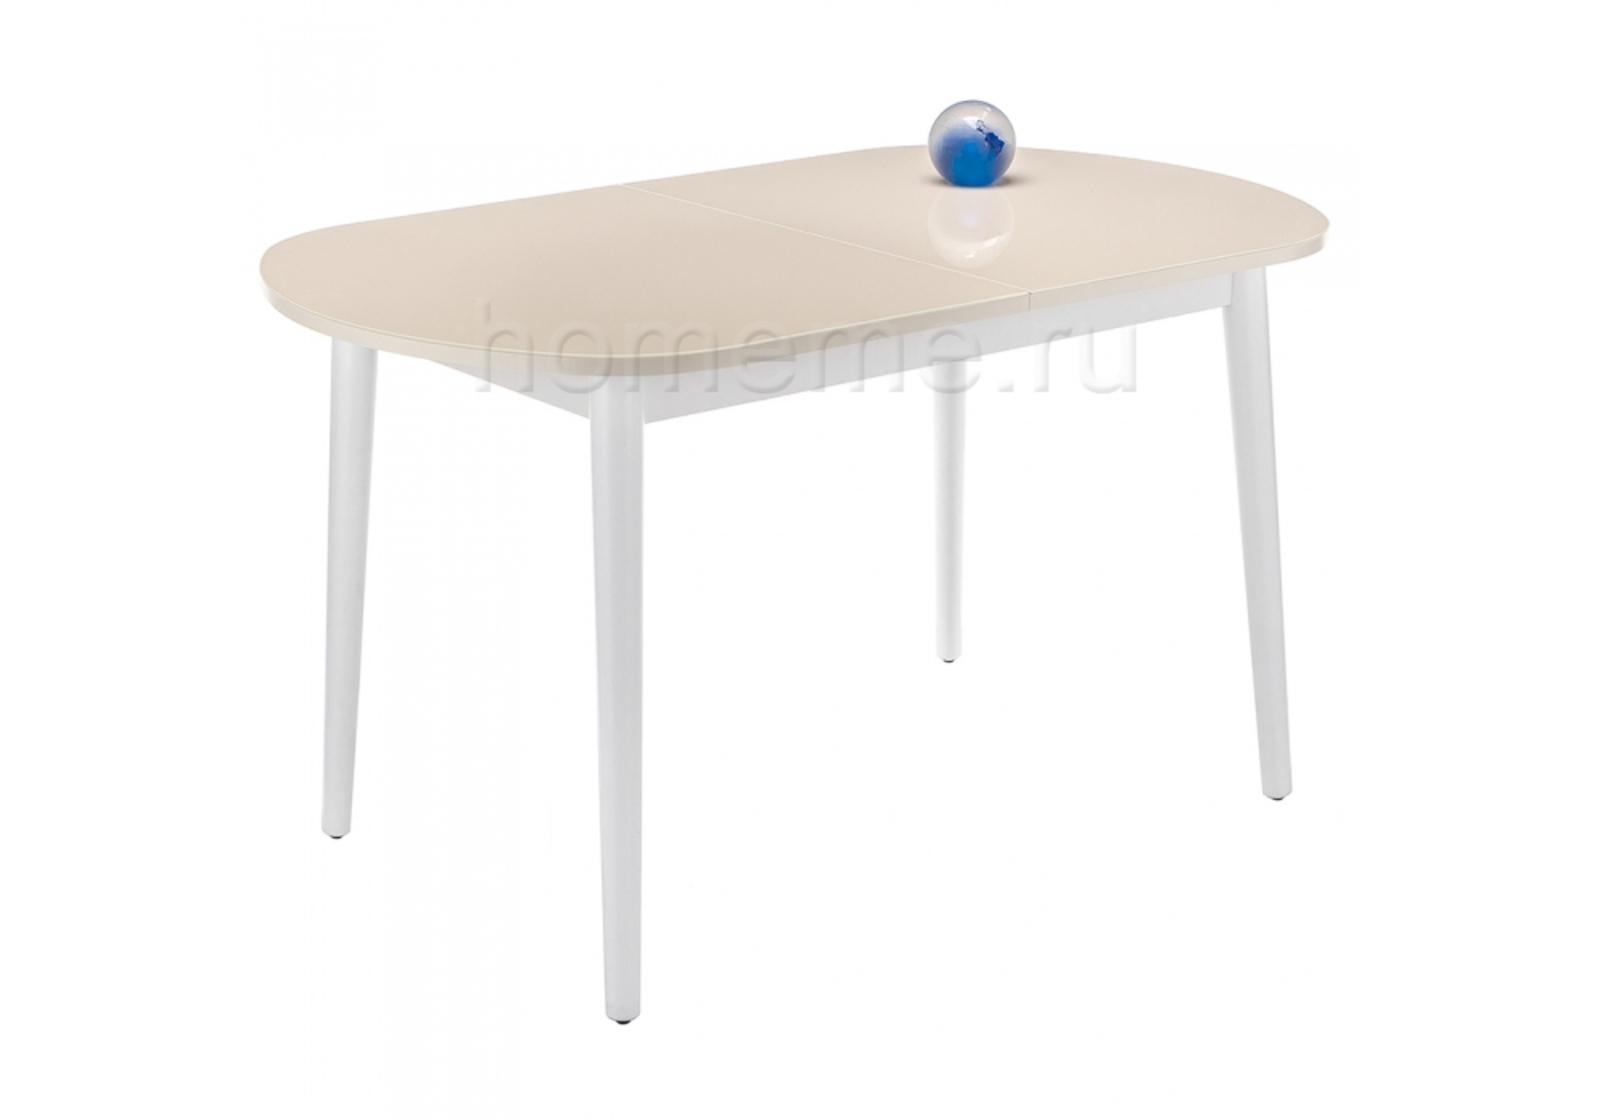 Кухонный стол HomeMe Брис 110 кремовый / белый 302620 от Homeme.ru